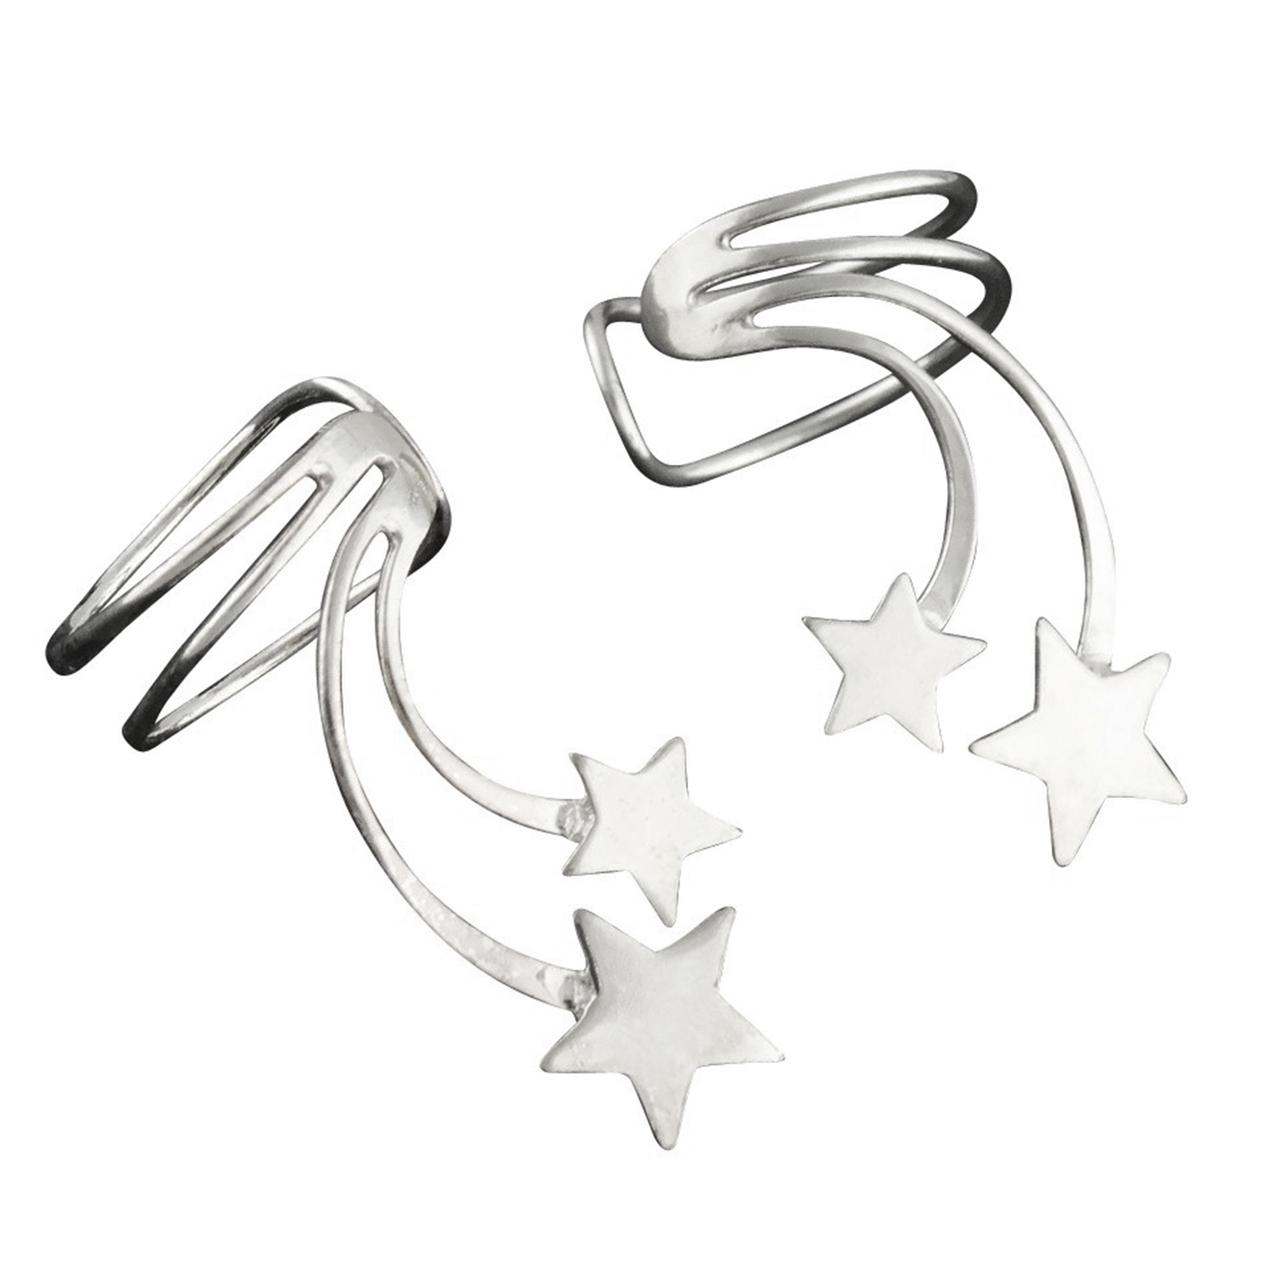 ''Sterling Silver Shooting Stars Ear Cuff Earrings, 1 Pair No piercing Slide on''